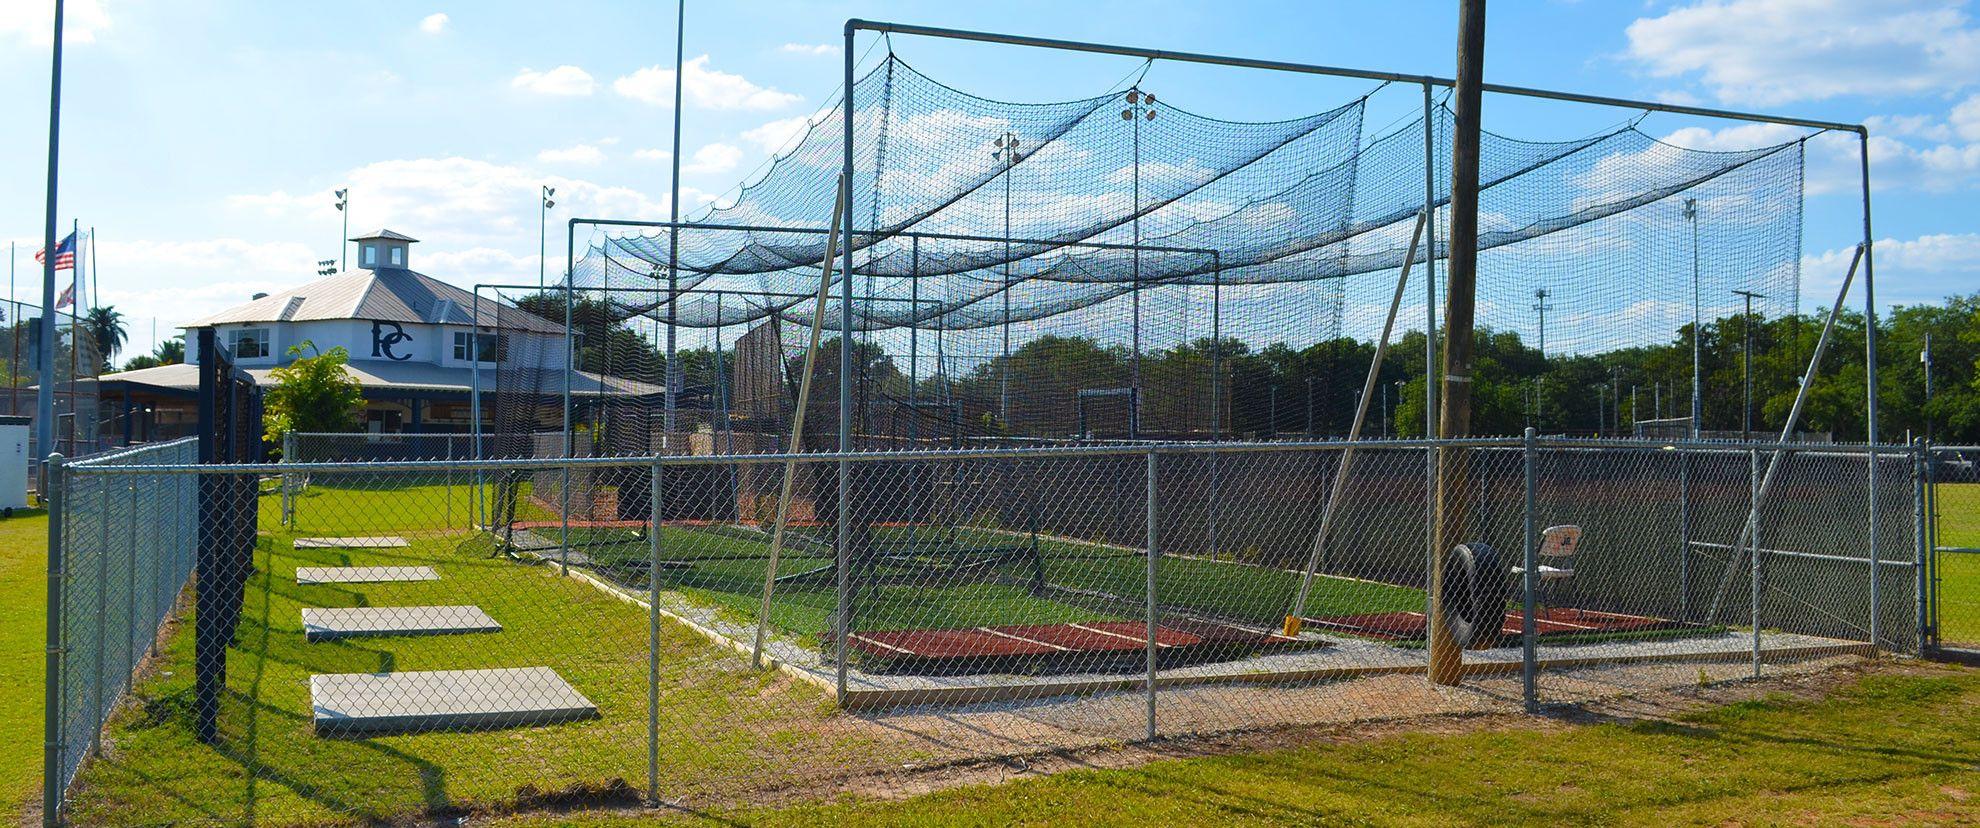 Baseball Softball Batting Cage Net Florida Net Company Batting Cages Little League Baseball Batting Cage Nets